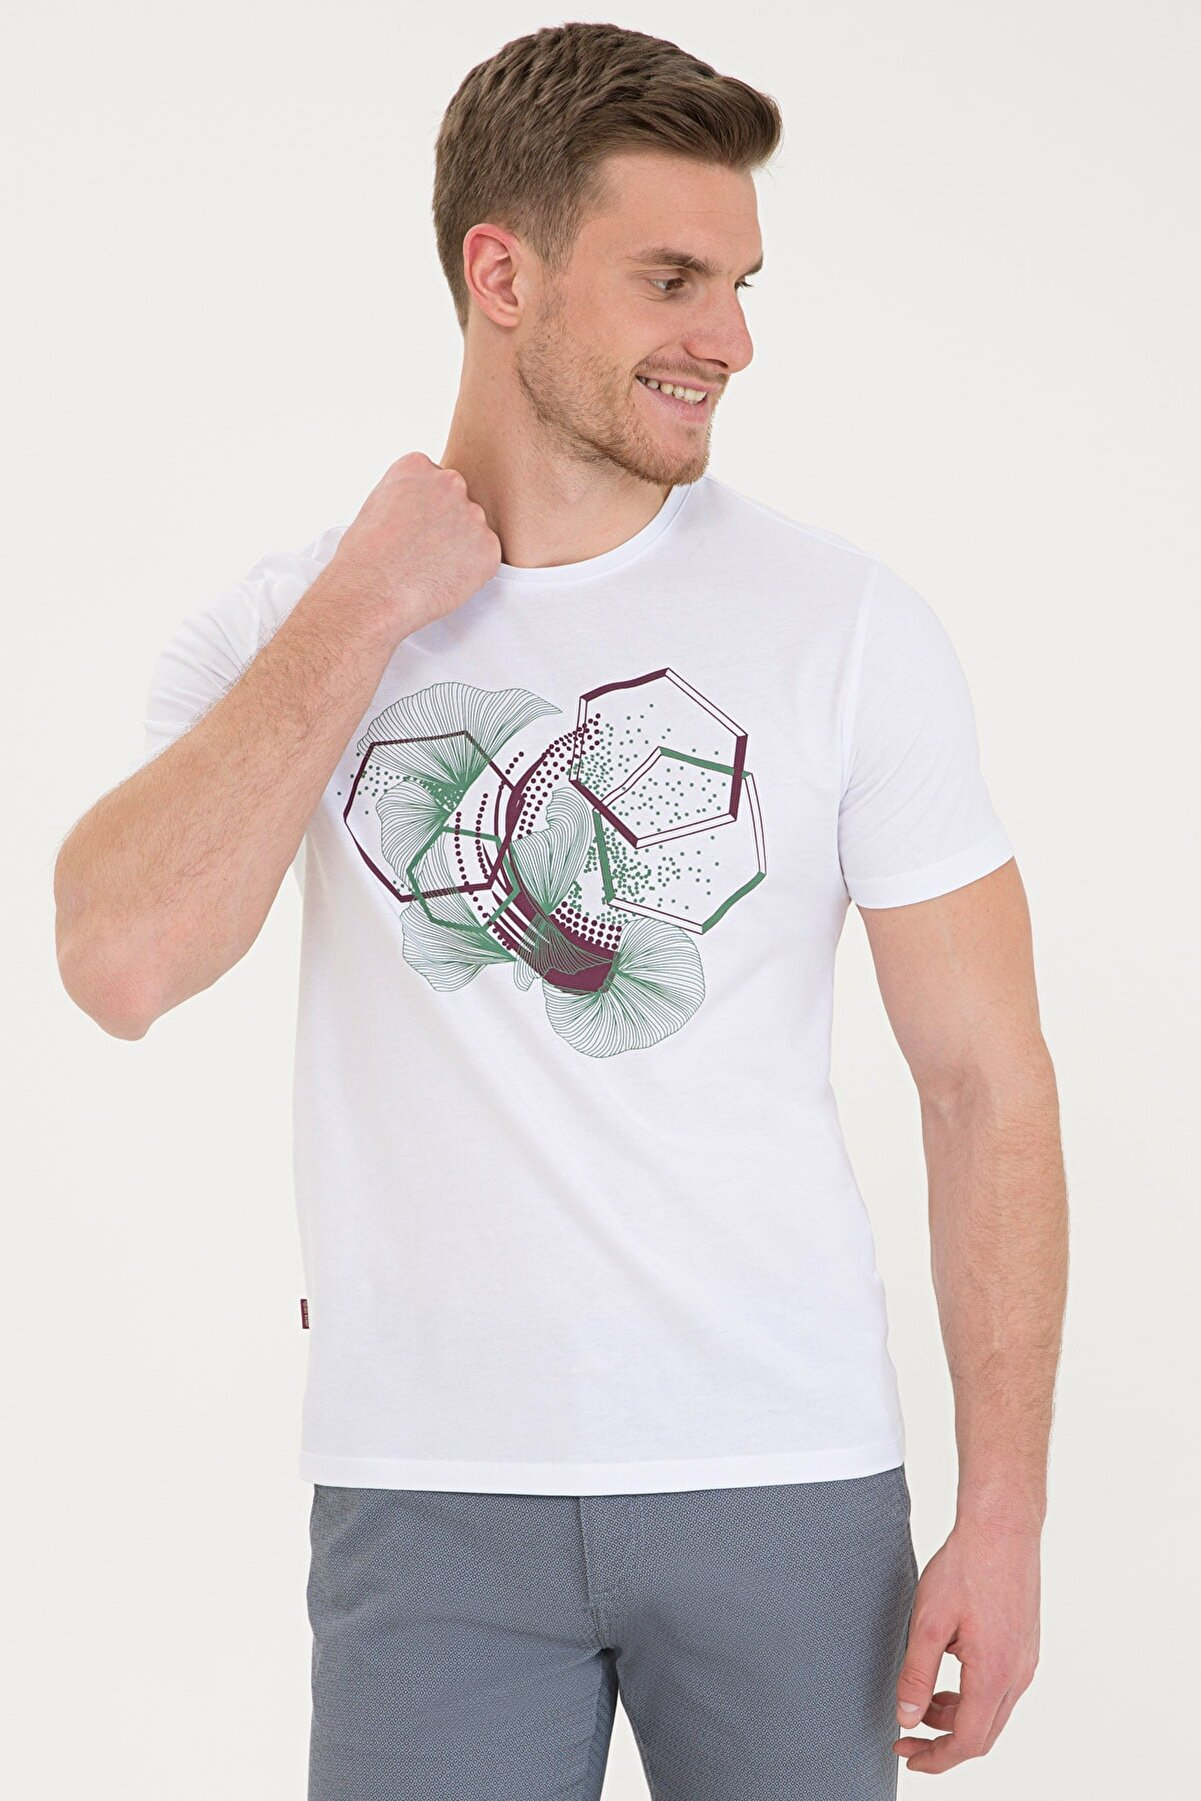 Pierre Cardin Beyaz Slim Fit Bisiklet Yaka T-Shirt